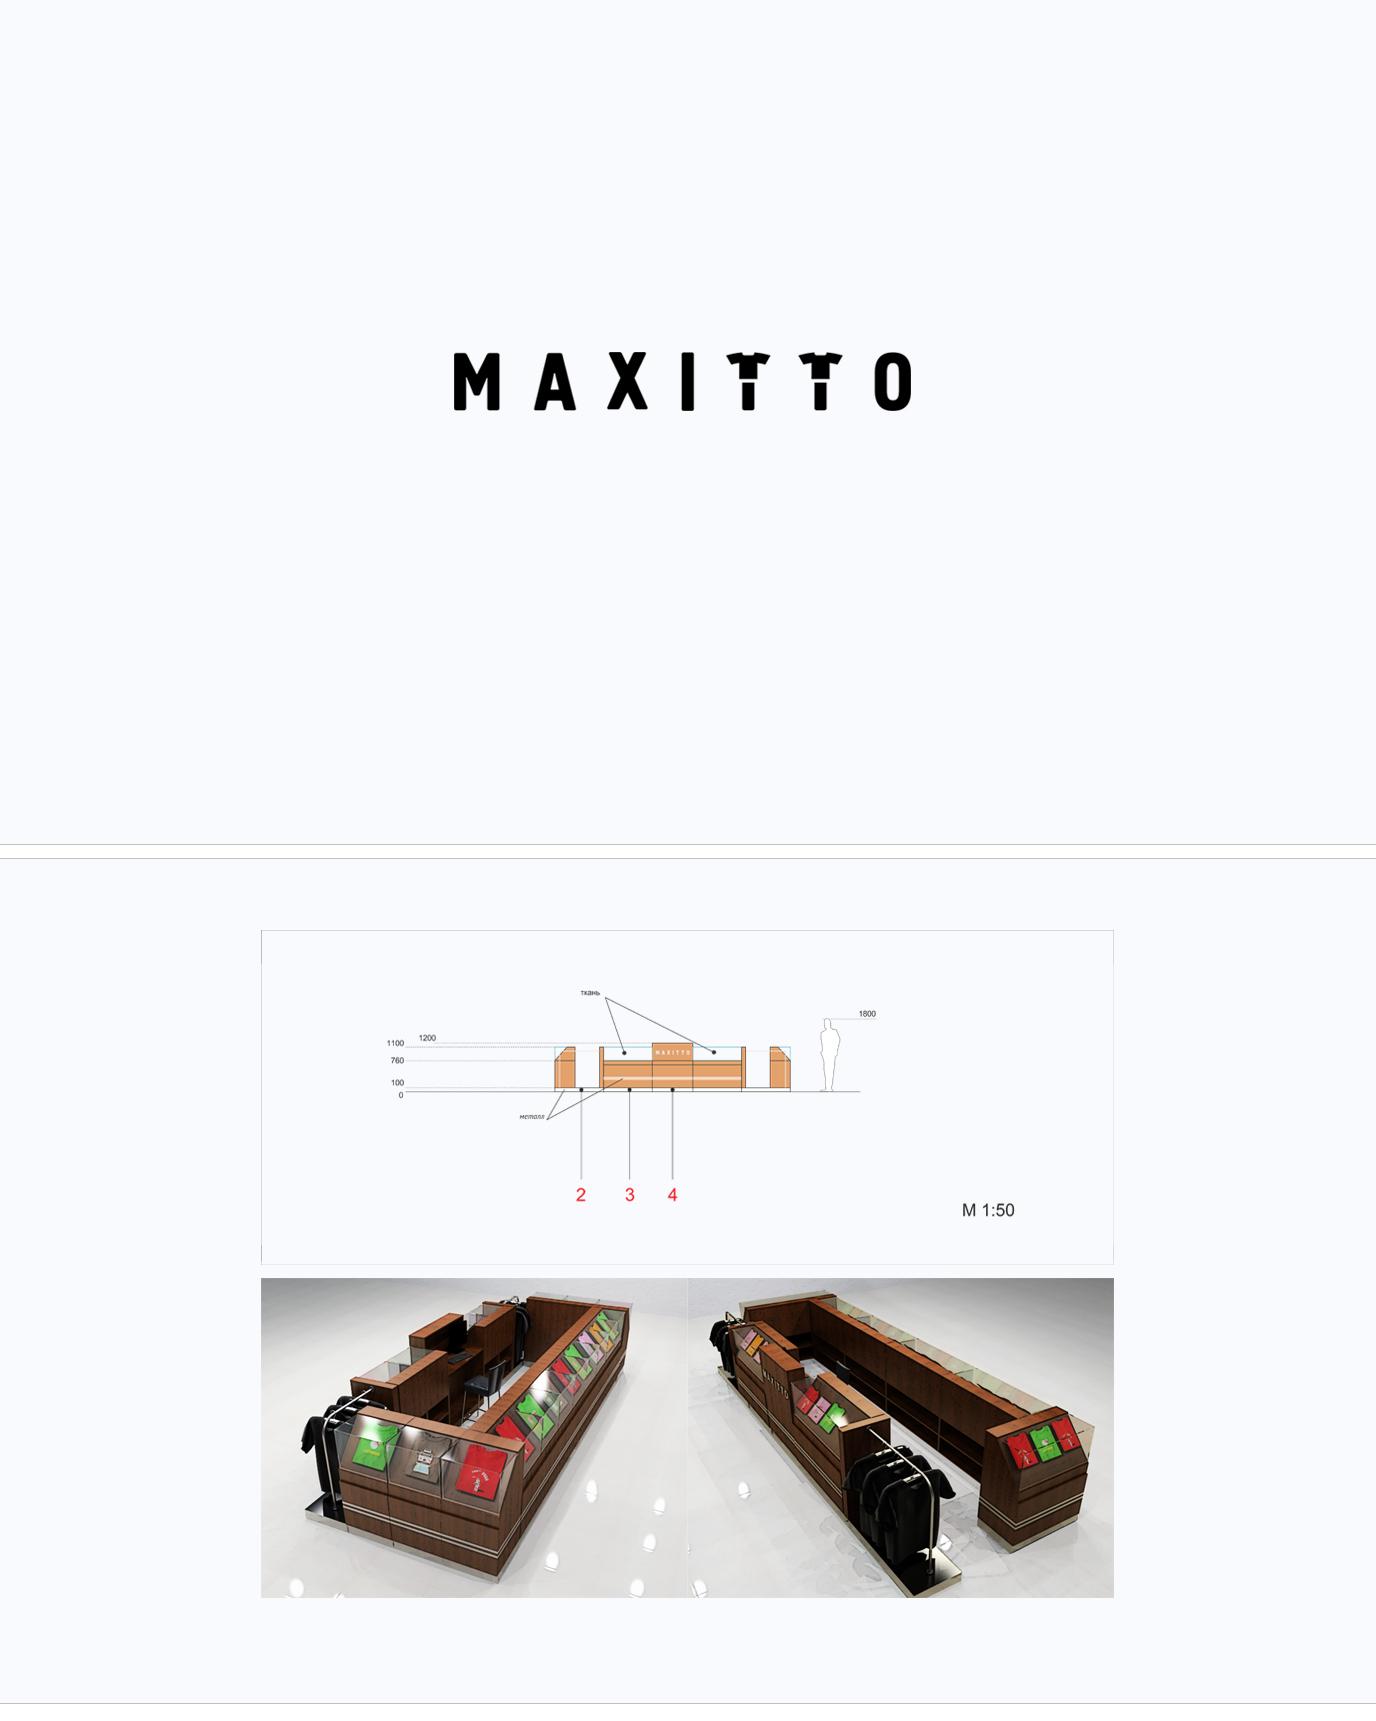 http://id1.ru/wp-content/uploads/2015/09/Maxitto.jpg